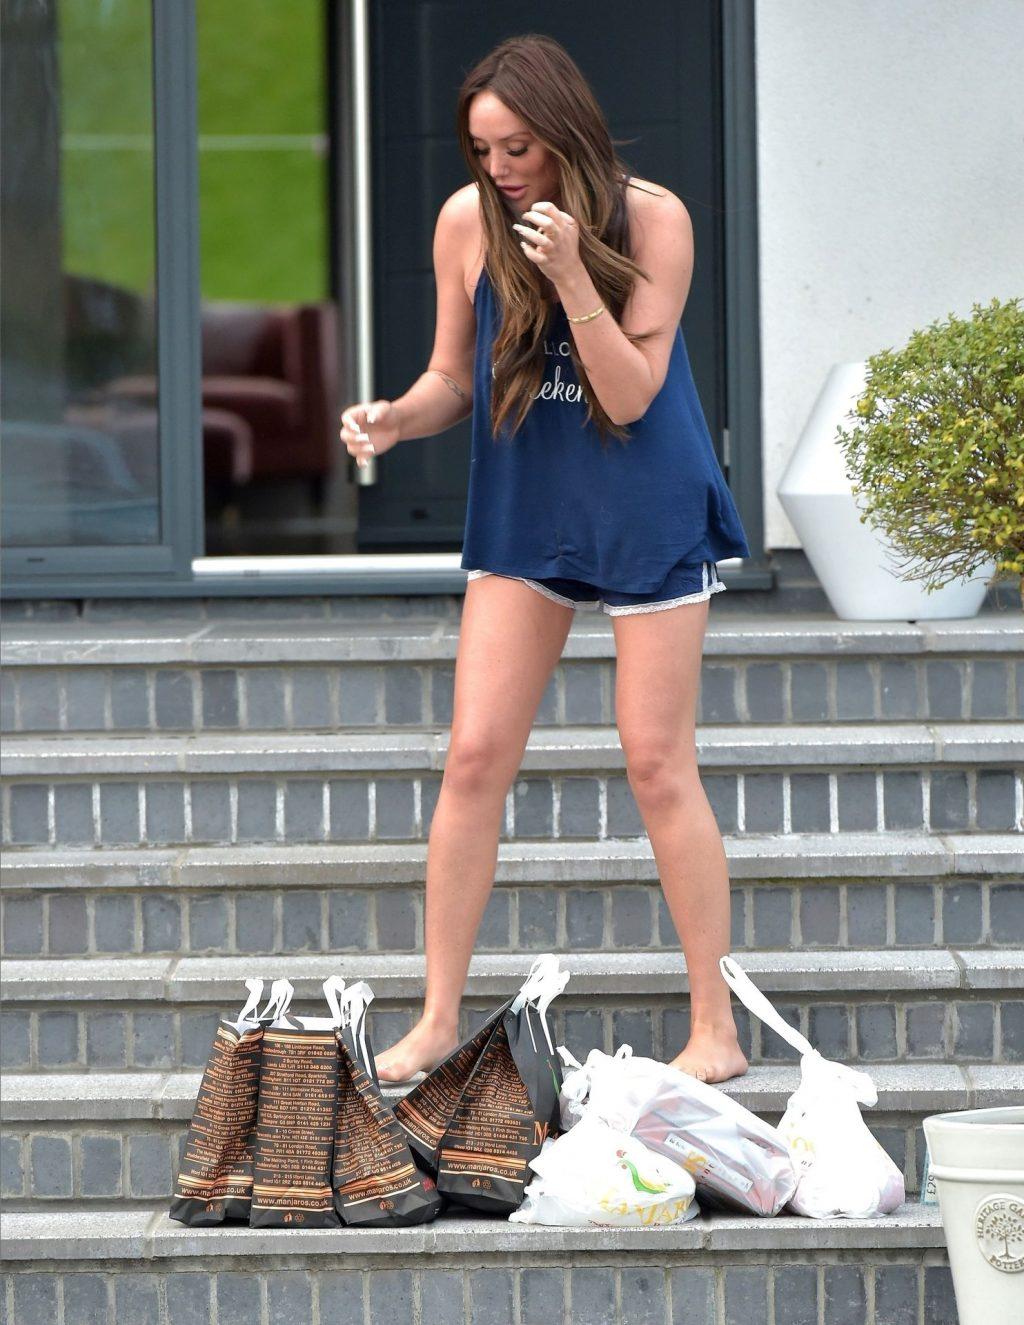 Charlotte Crosby Takes in Large Food Order Wearing PJ's (22 Photos)